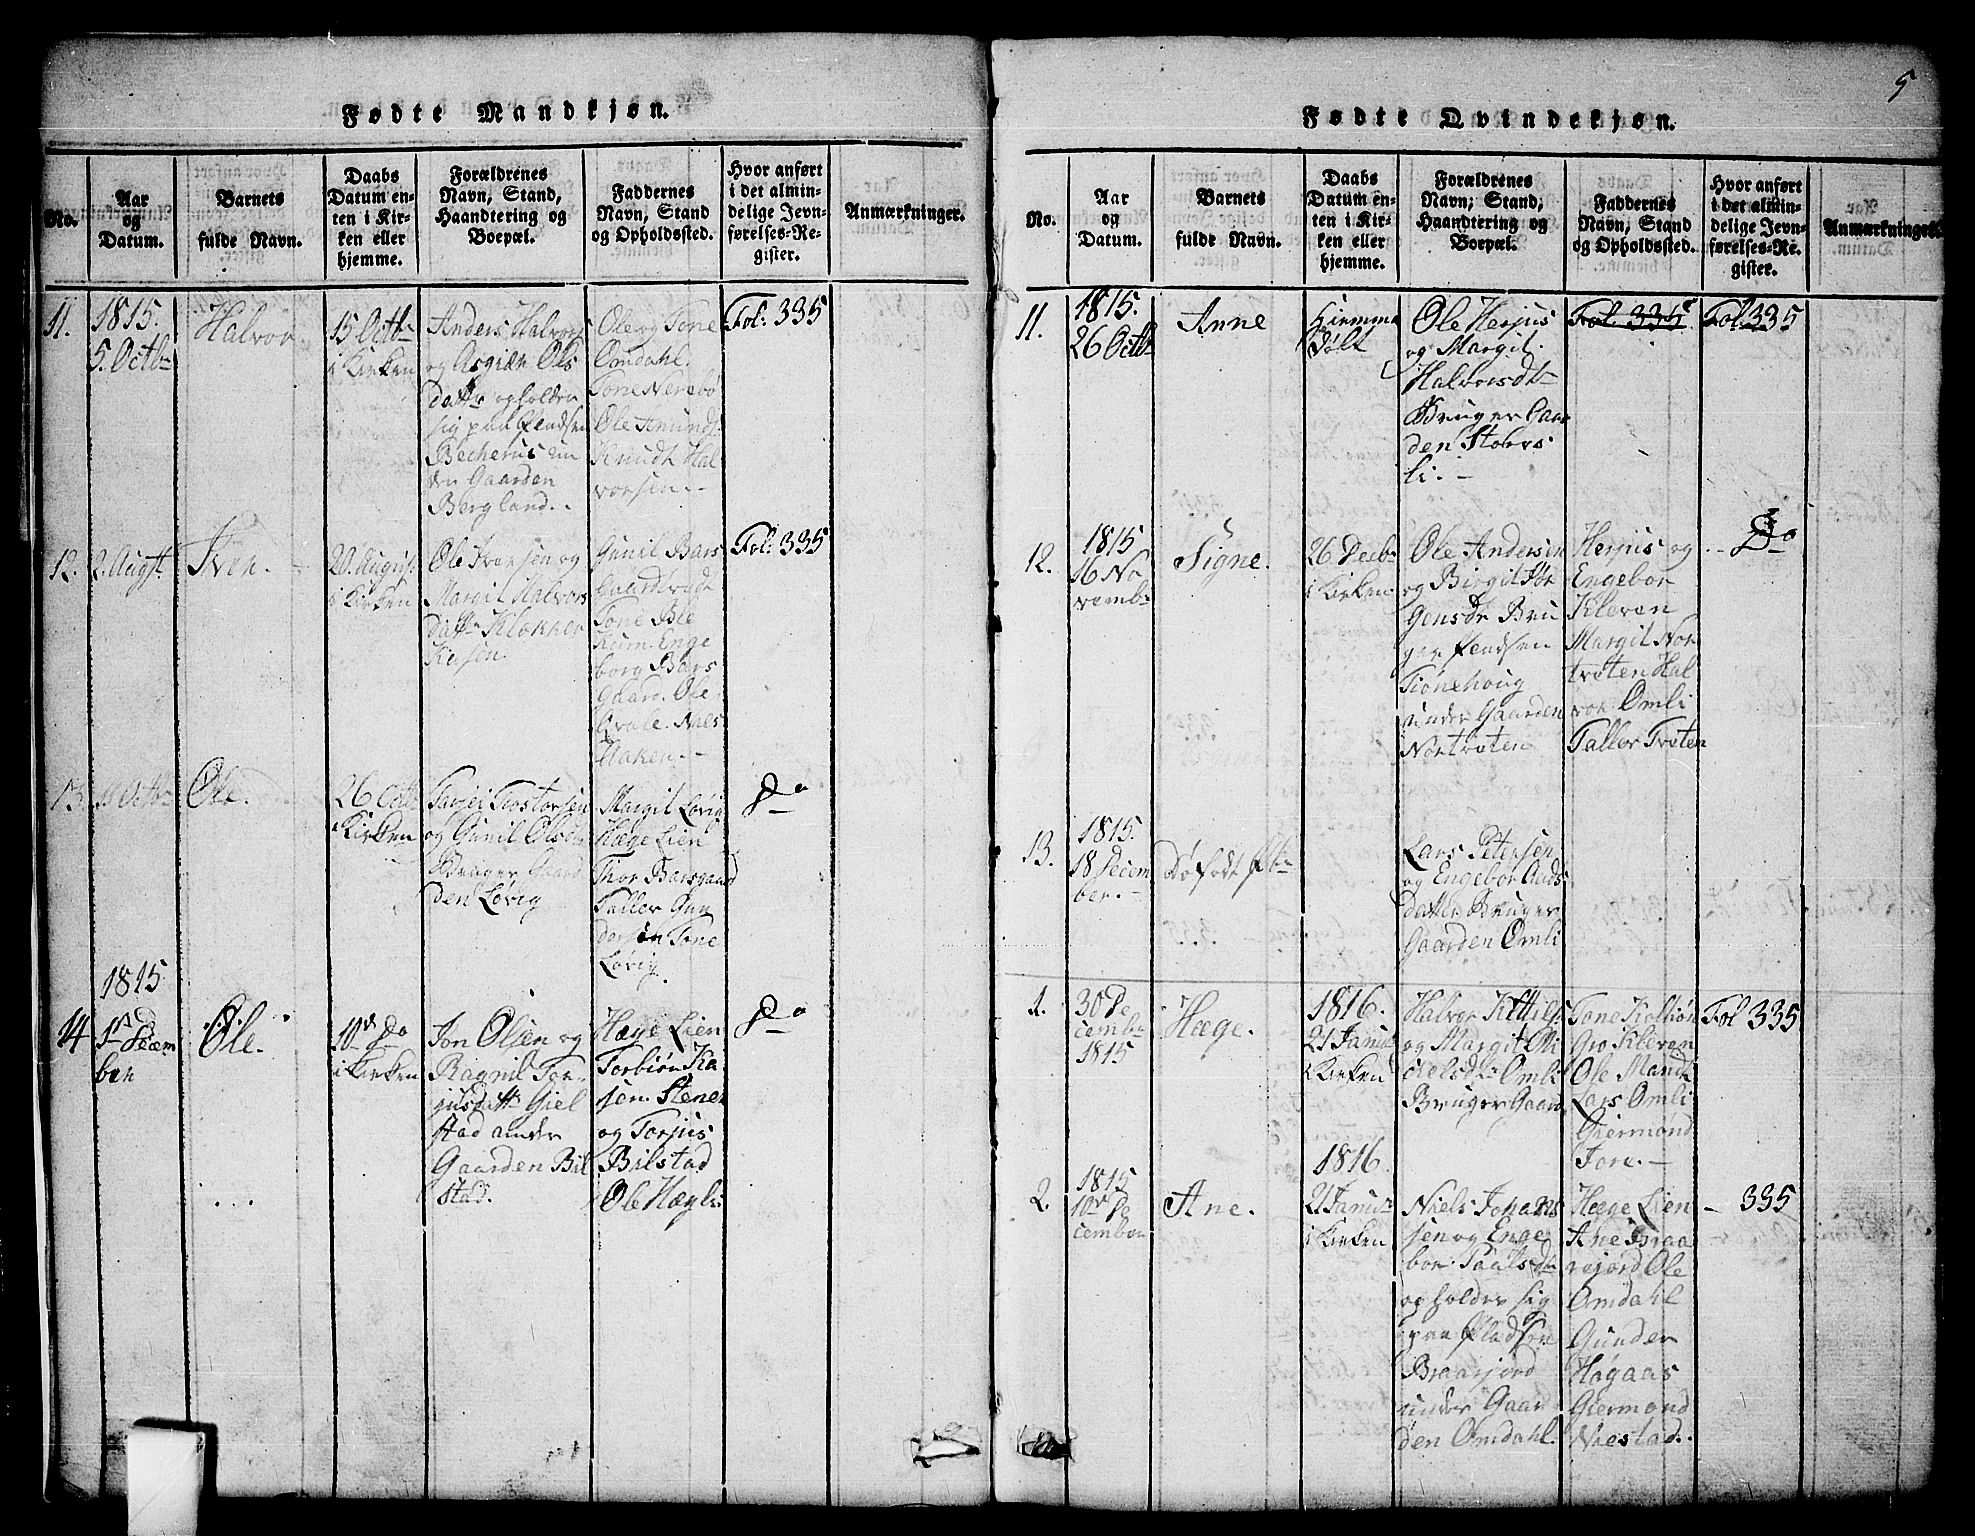 SAKO, Mo kirkebøker, G/Gb/L0001: Klokkerbok nr. II 1, 1814-1843, s. 5